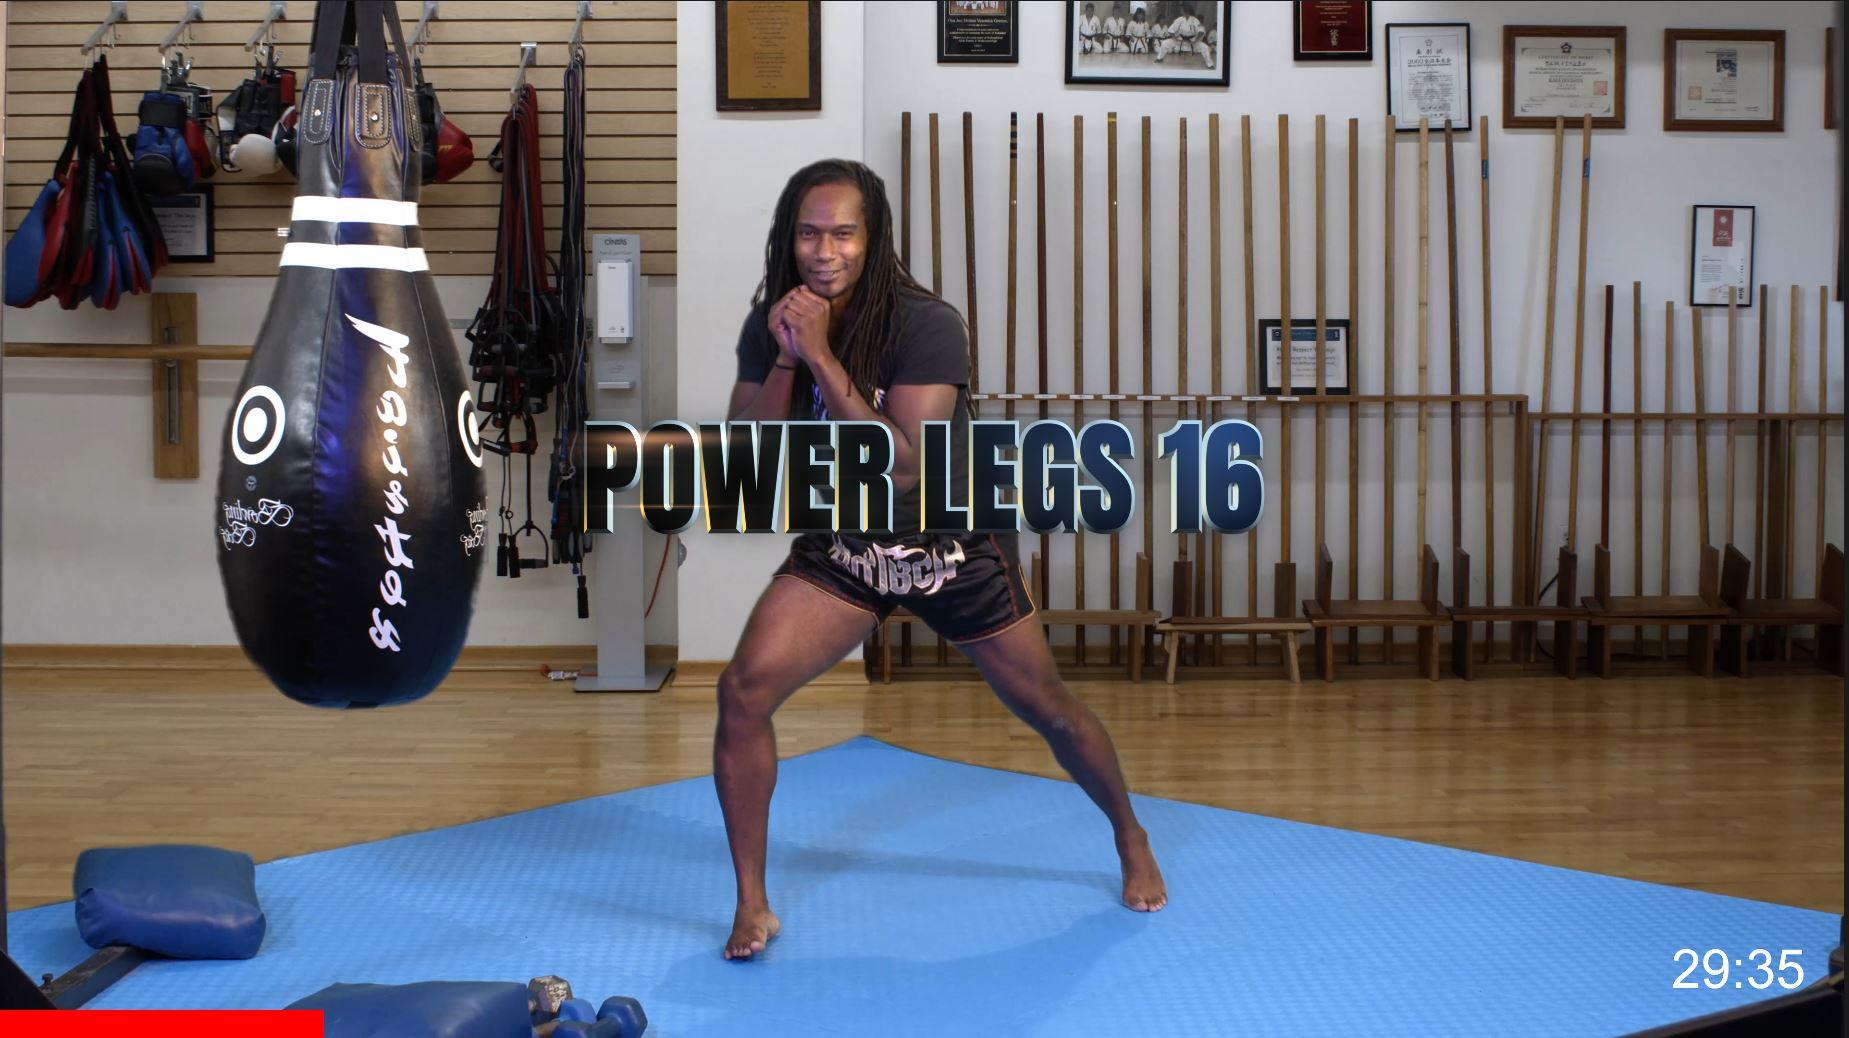 Power Legs 16